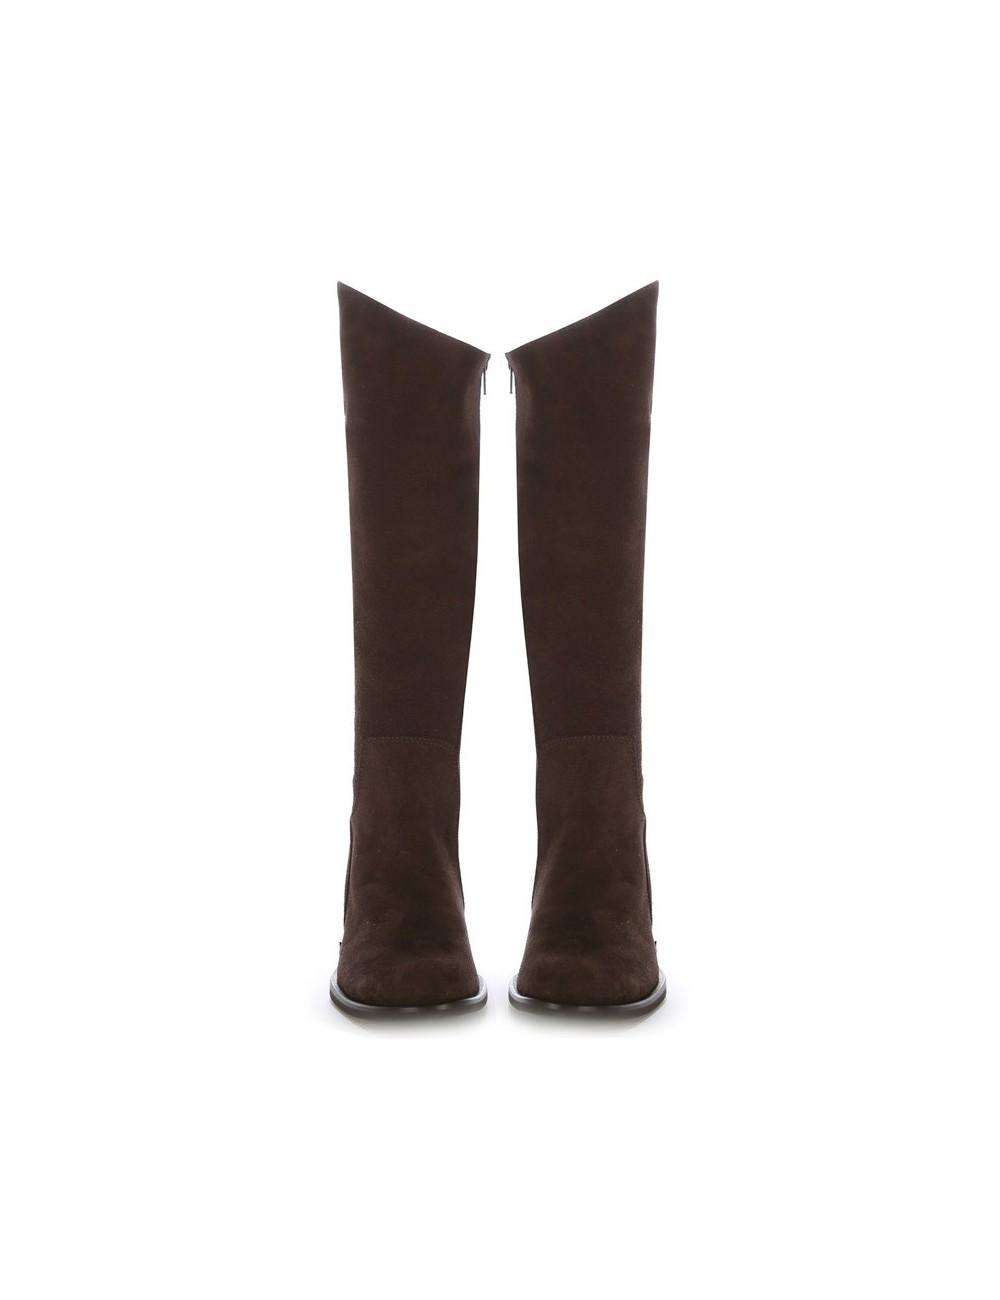 Bottes cavalières sur mesure cuir marron suedé